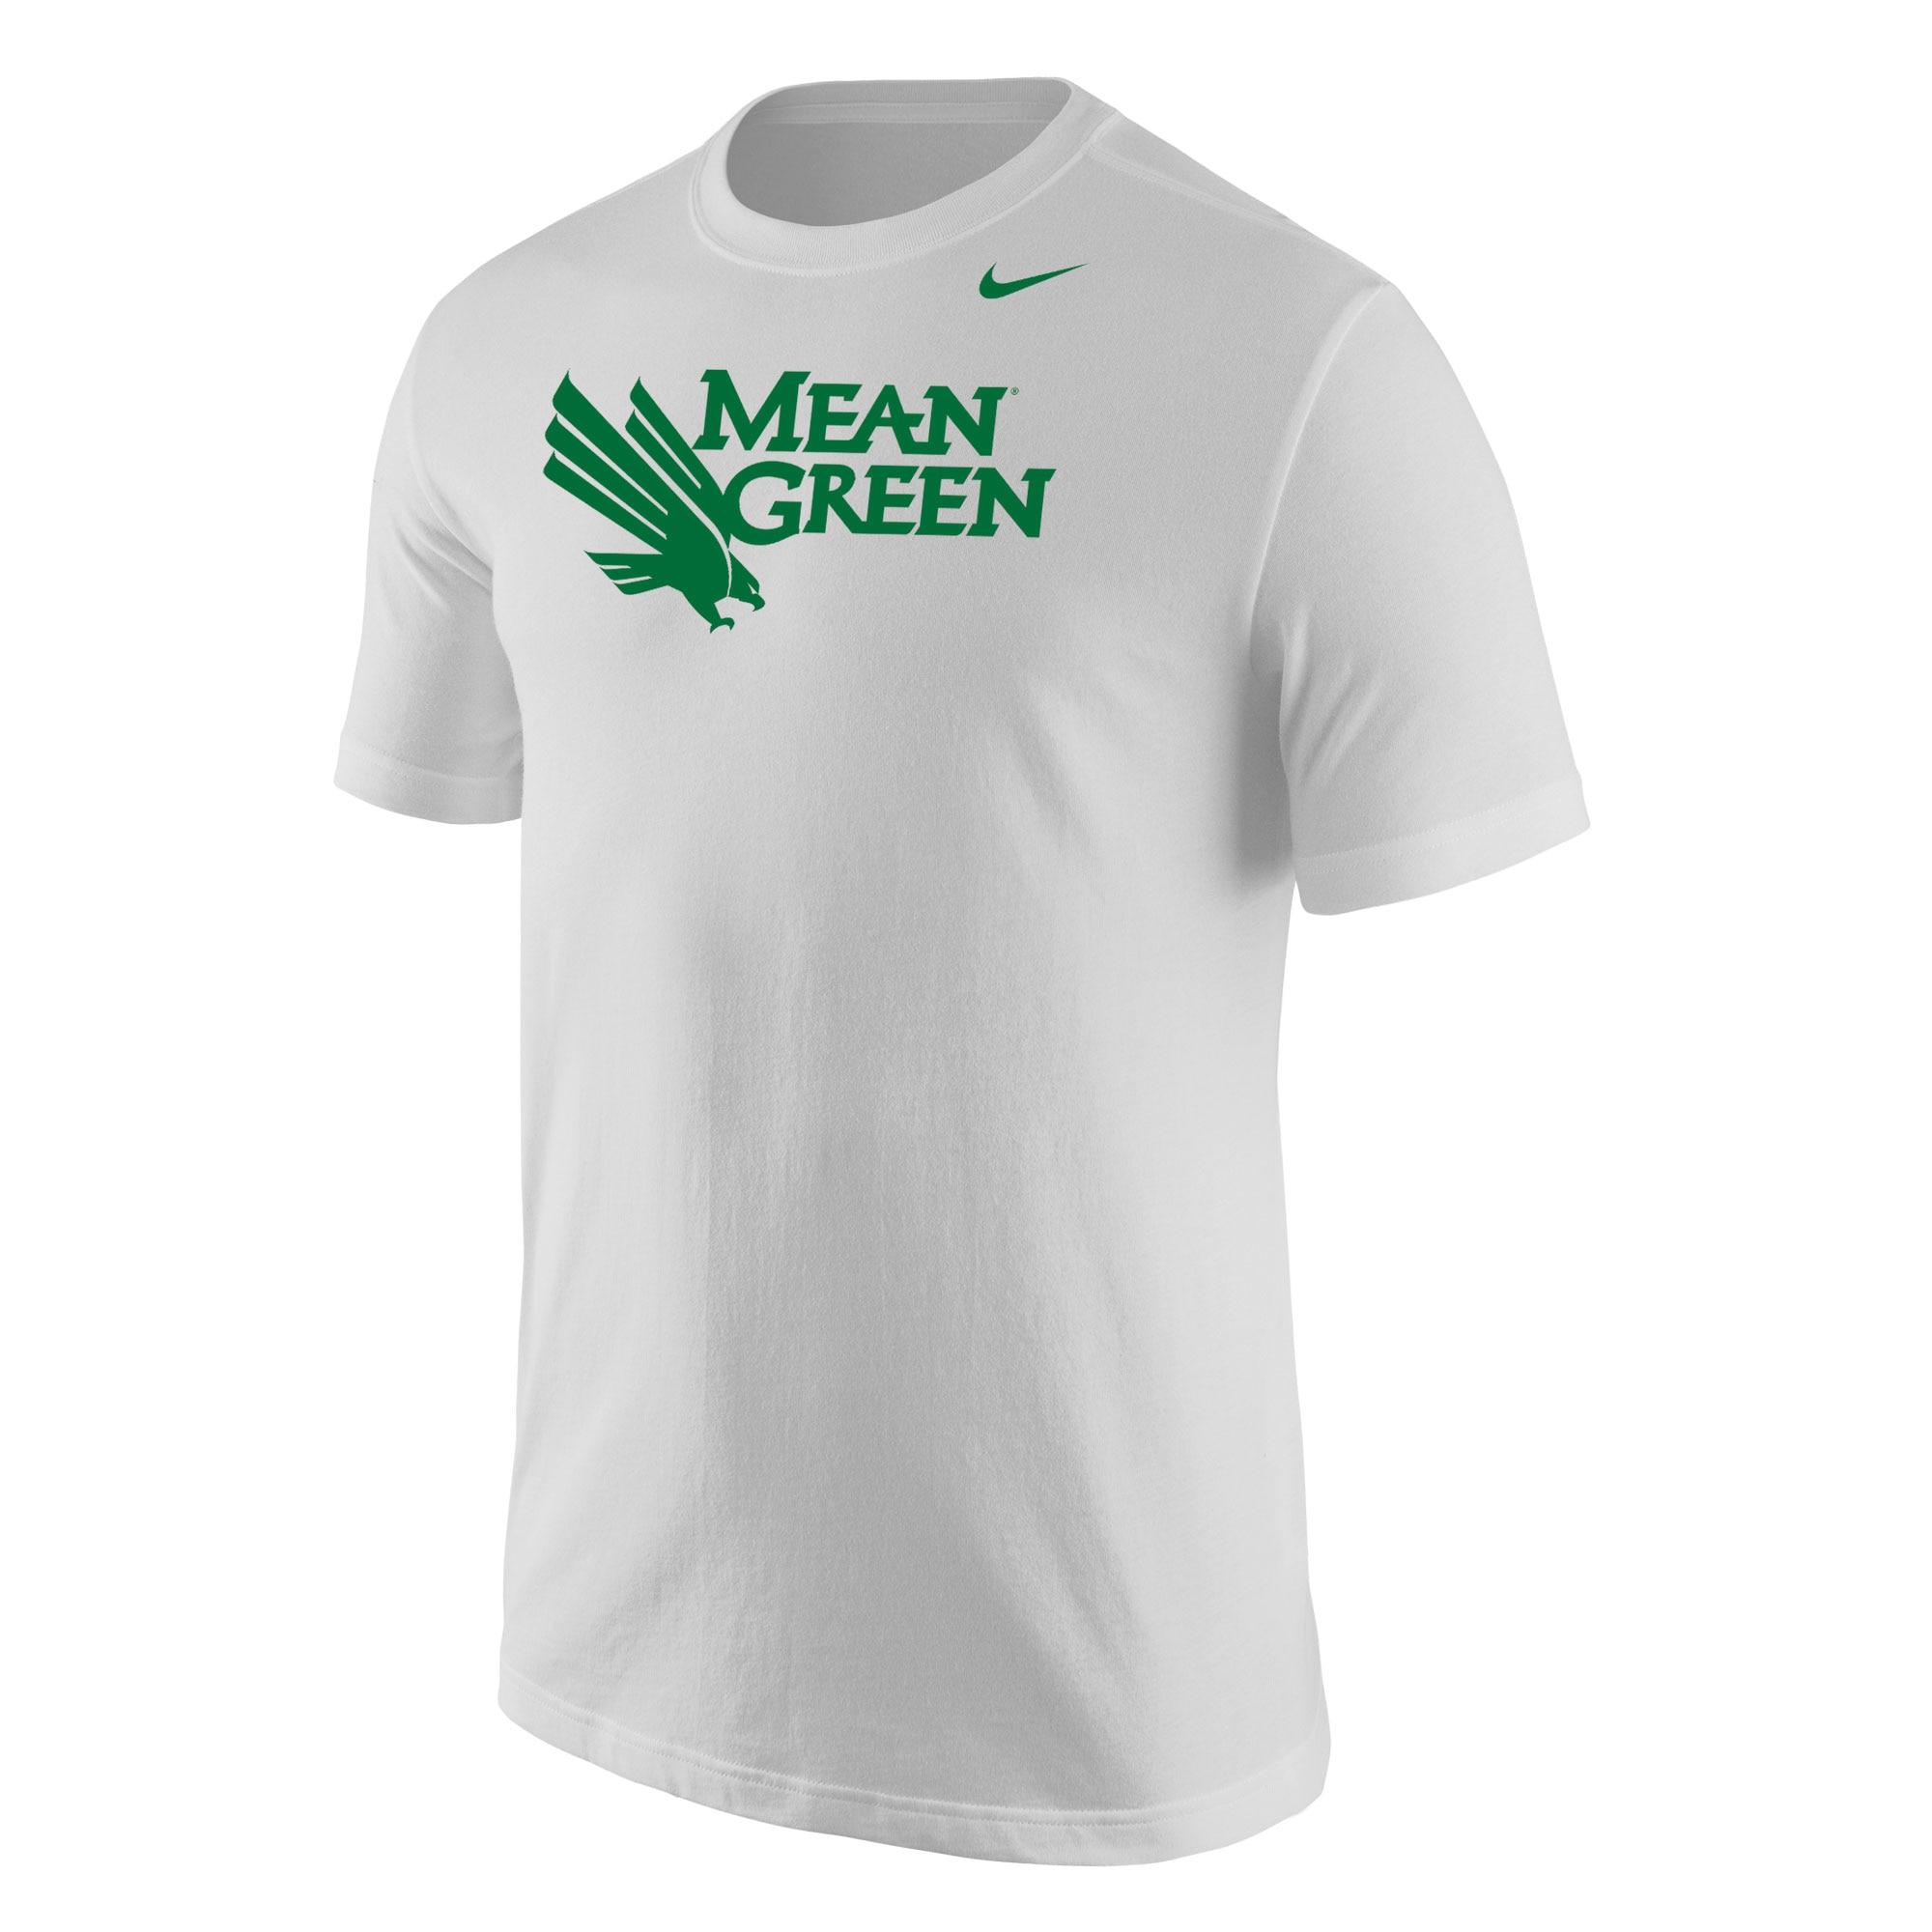 University of North Texas Nike Core Cotton Short Sleeve T-Shirt